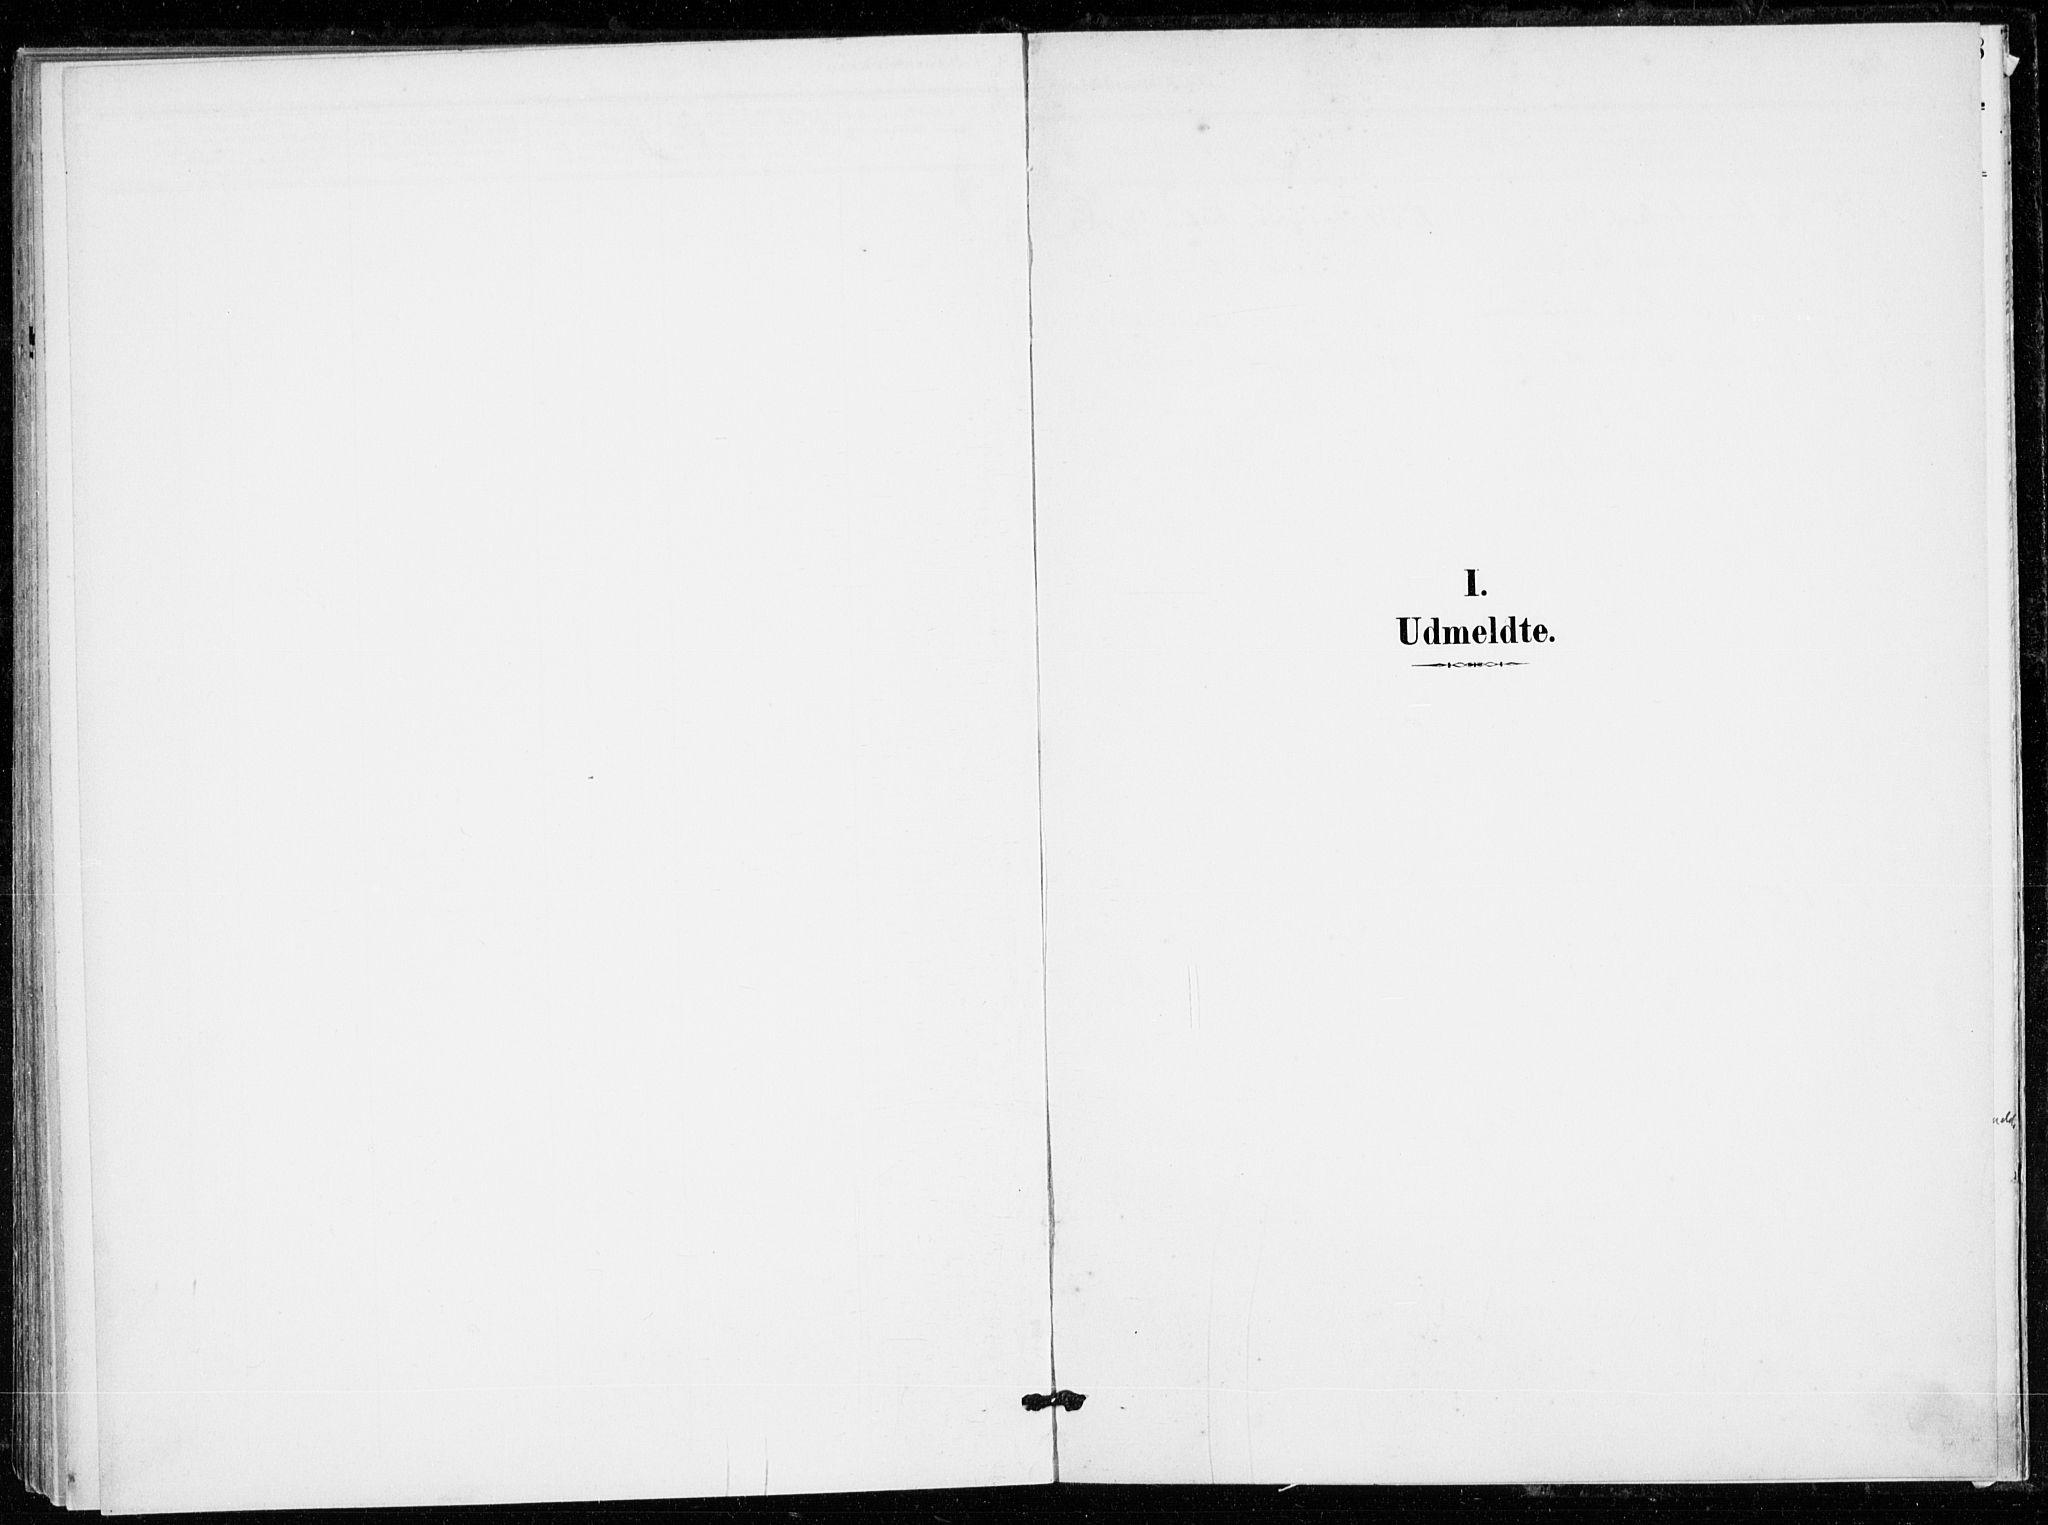 SAKO, Skåtøy kirkebøker, F/Fa/L0005: Parish register (official) no. I 5, 1901-1923